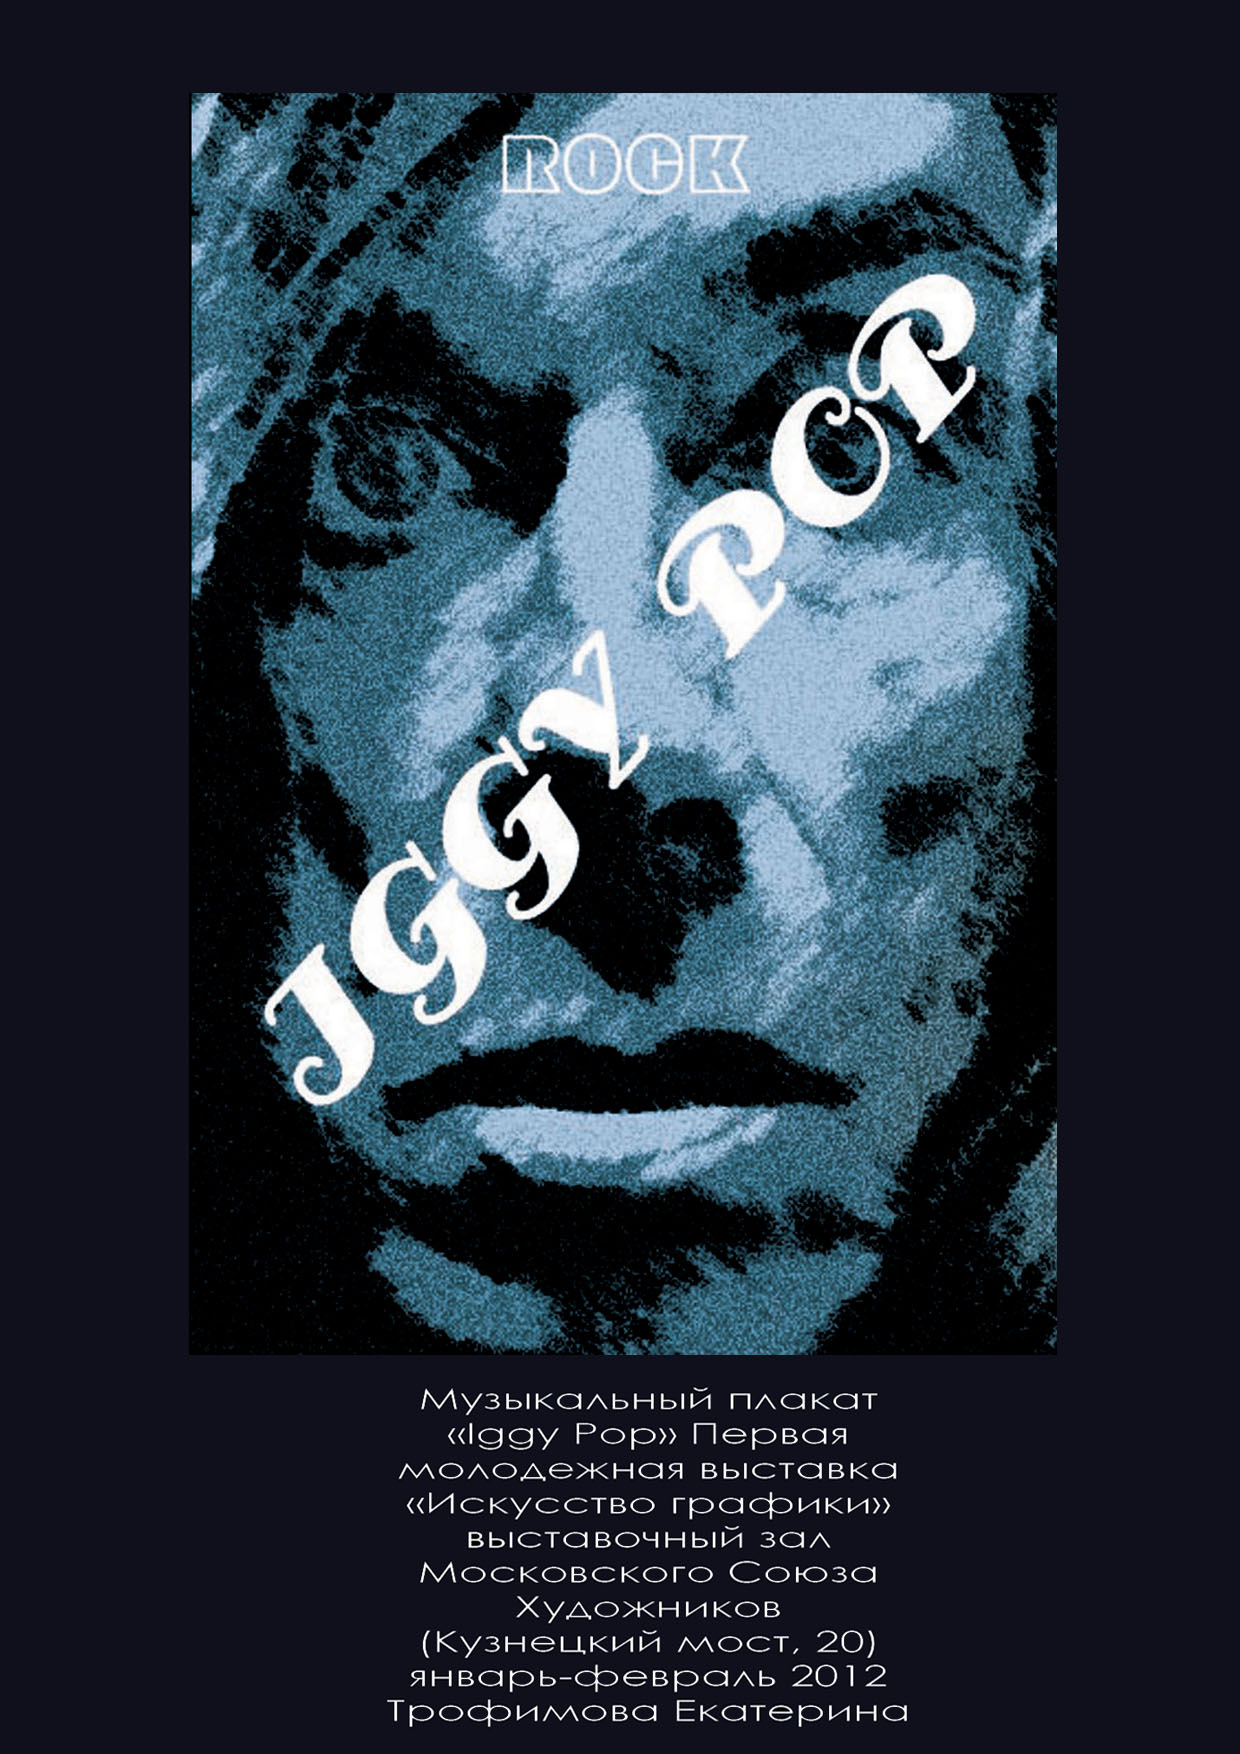 Iggy Pop Зрелищный плакат